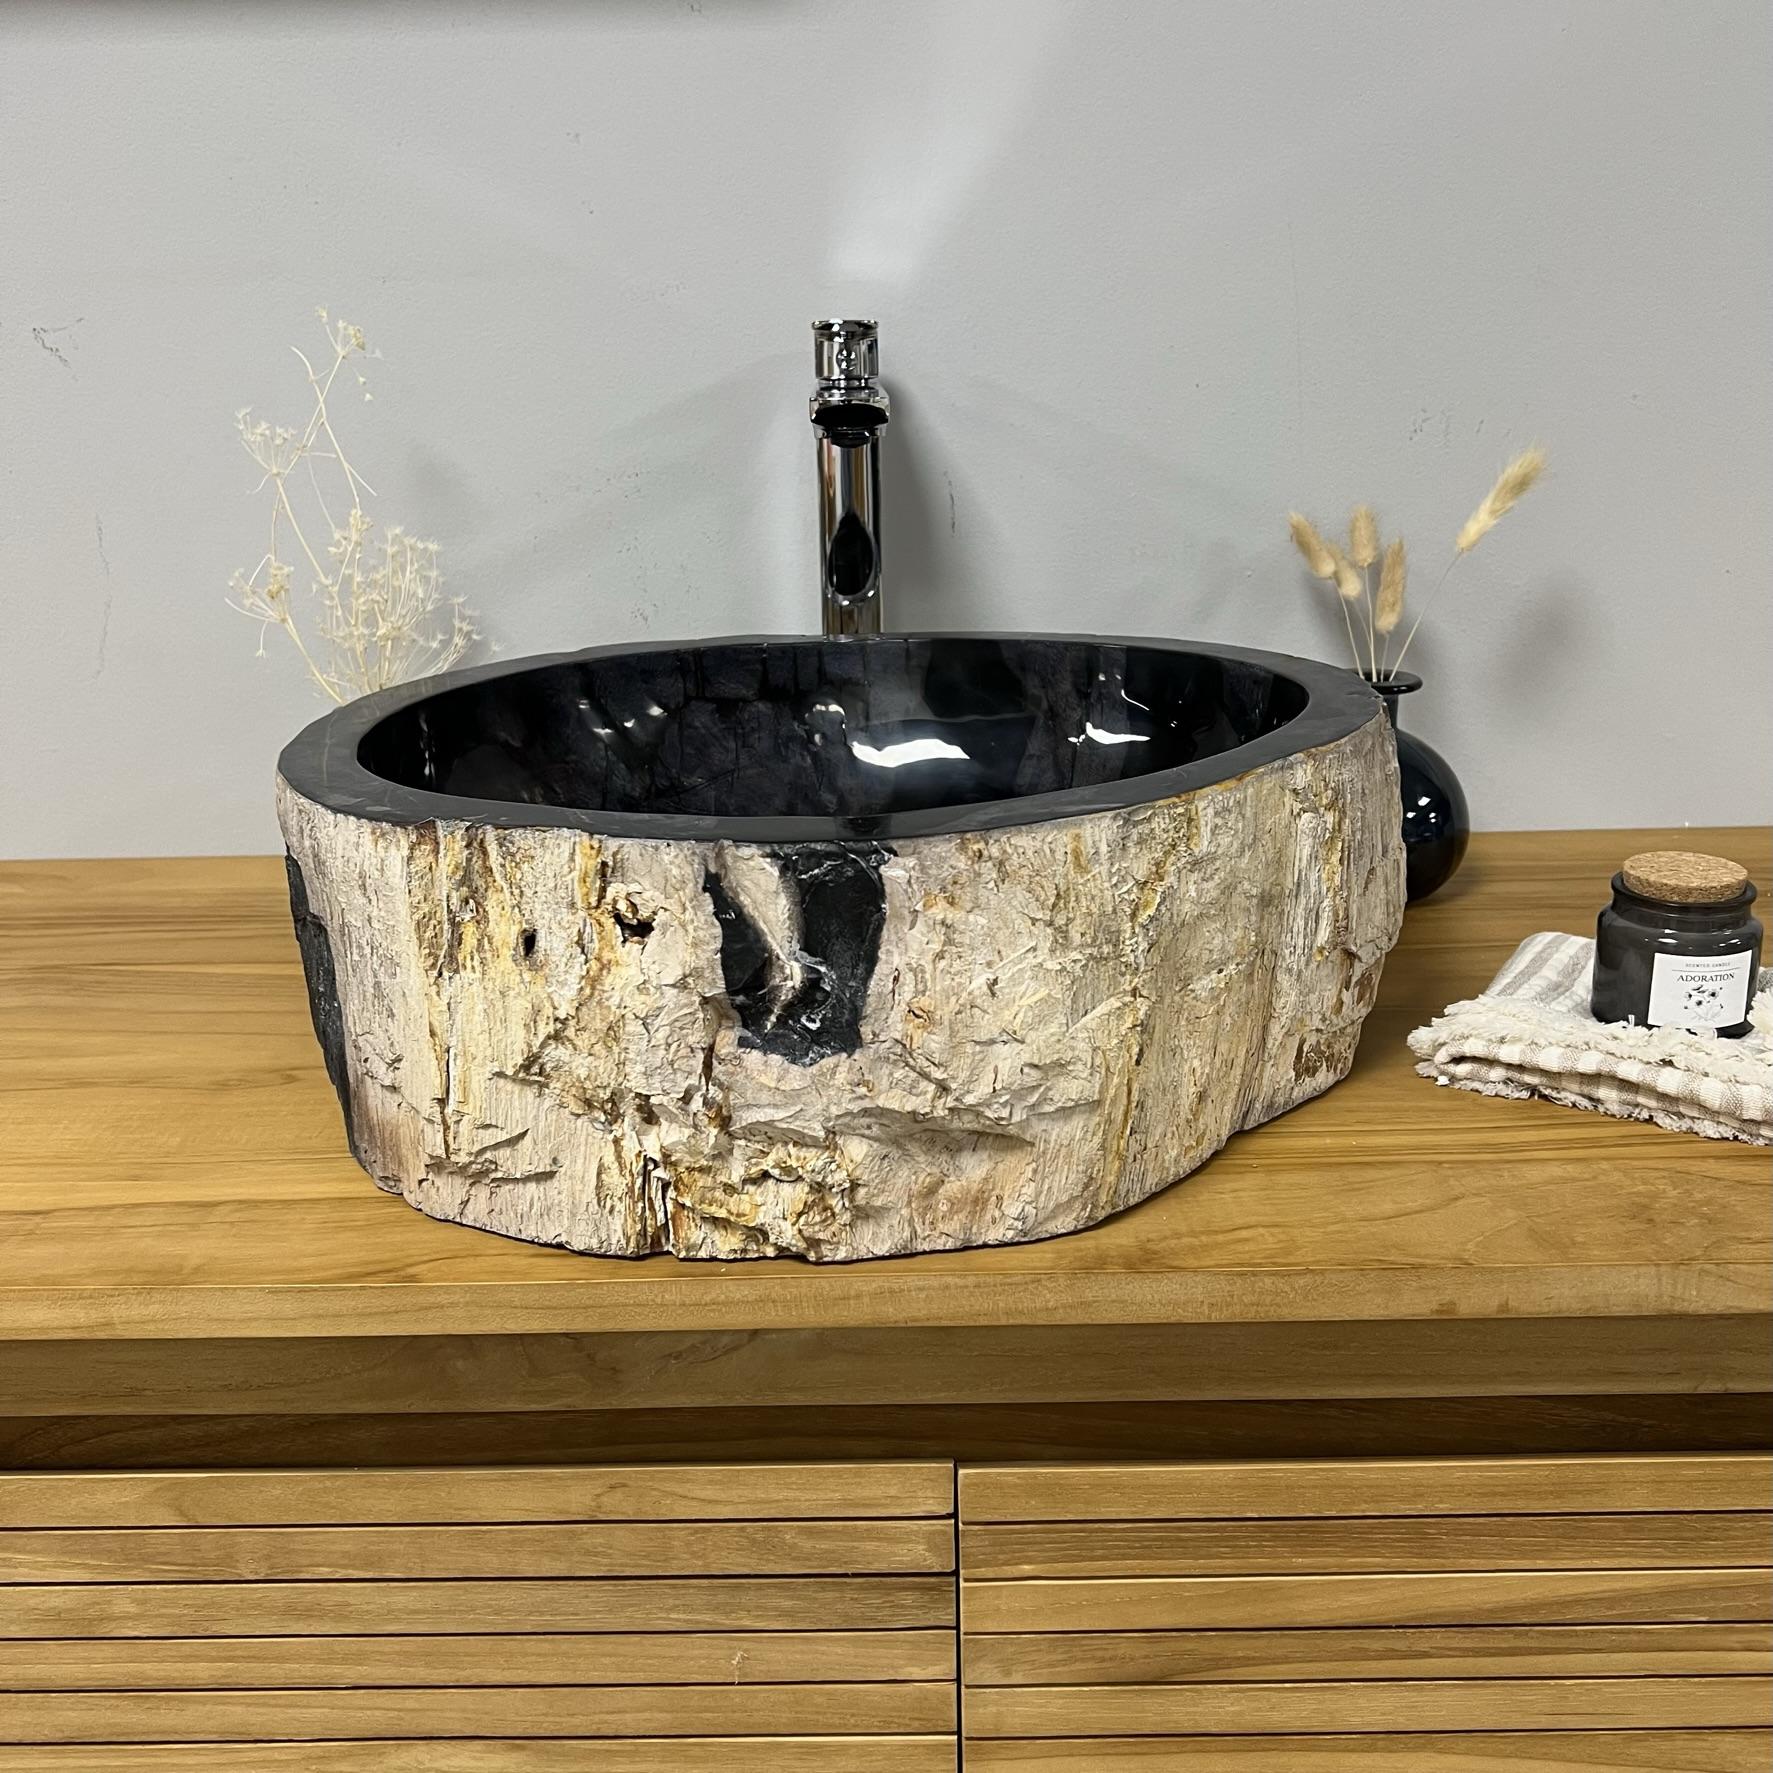 lavabo encimera de madera petrificada fosilizada 50 cm. Black Bedroom Furniture Sets. Home Design Ideas